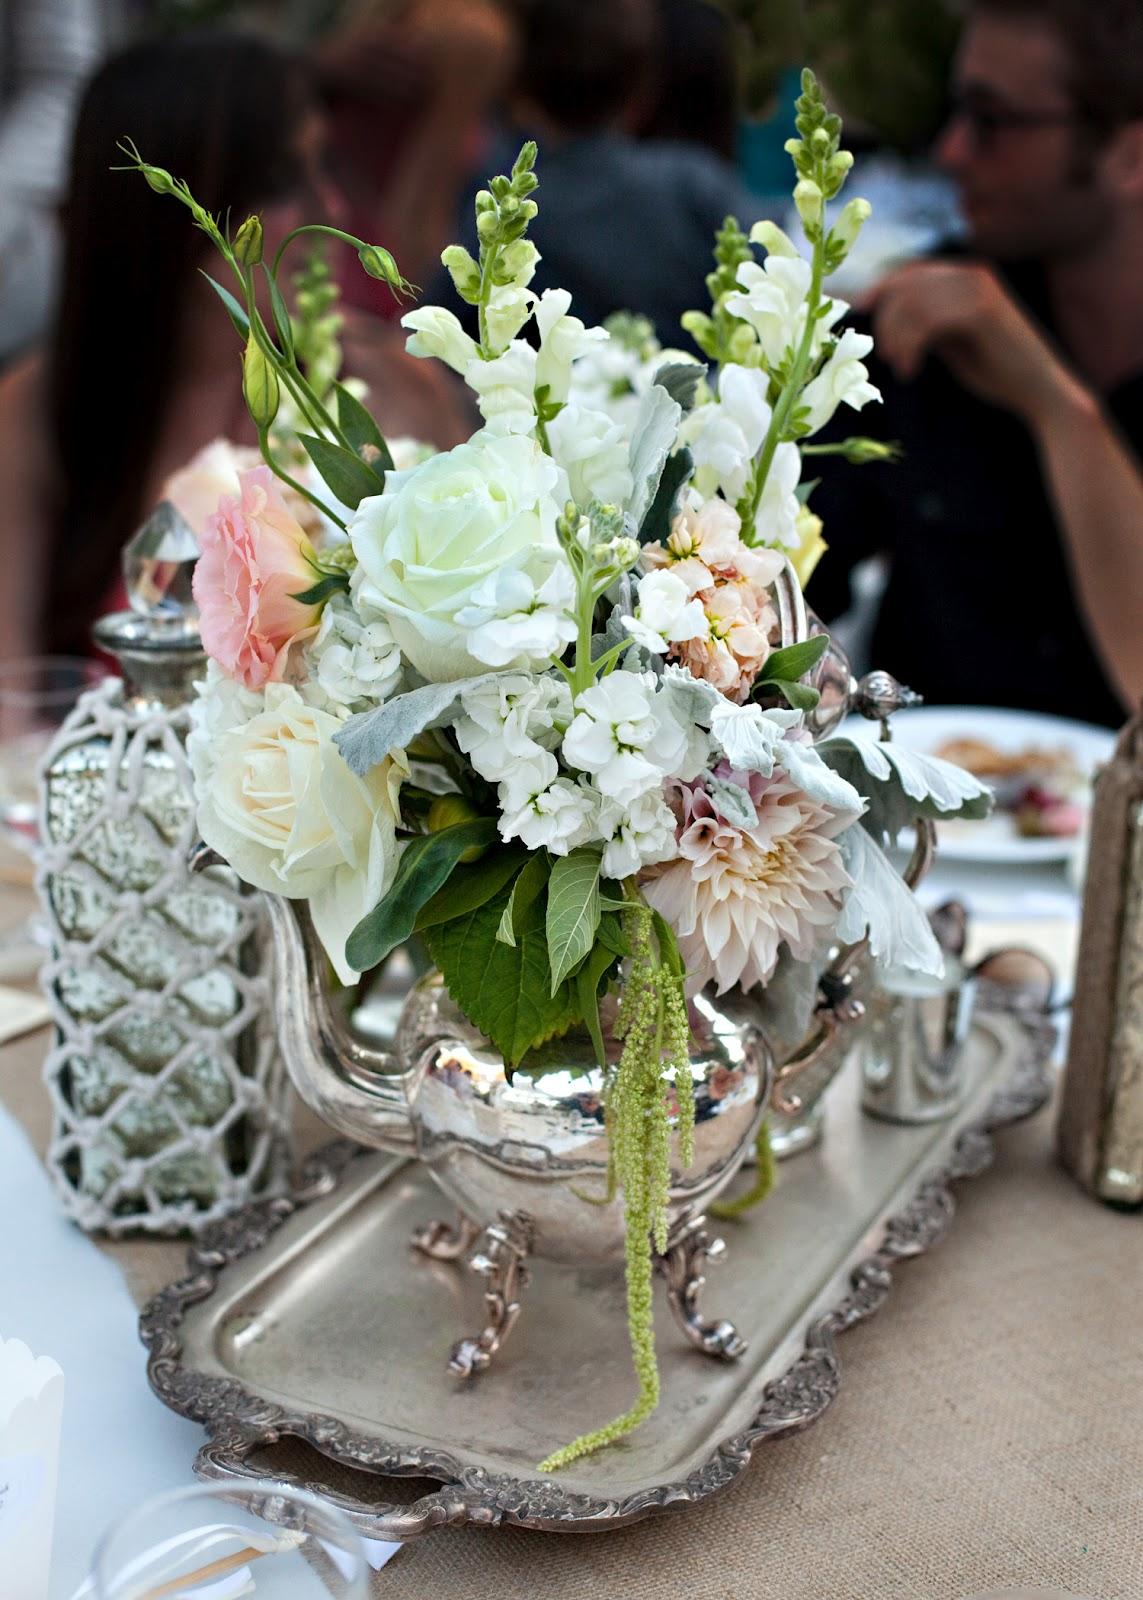 October Wedding Centerpiece Ideas